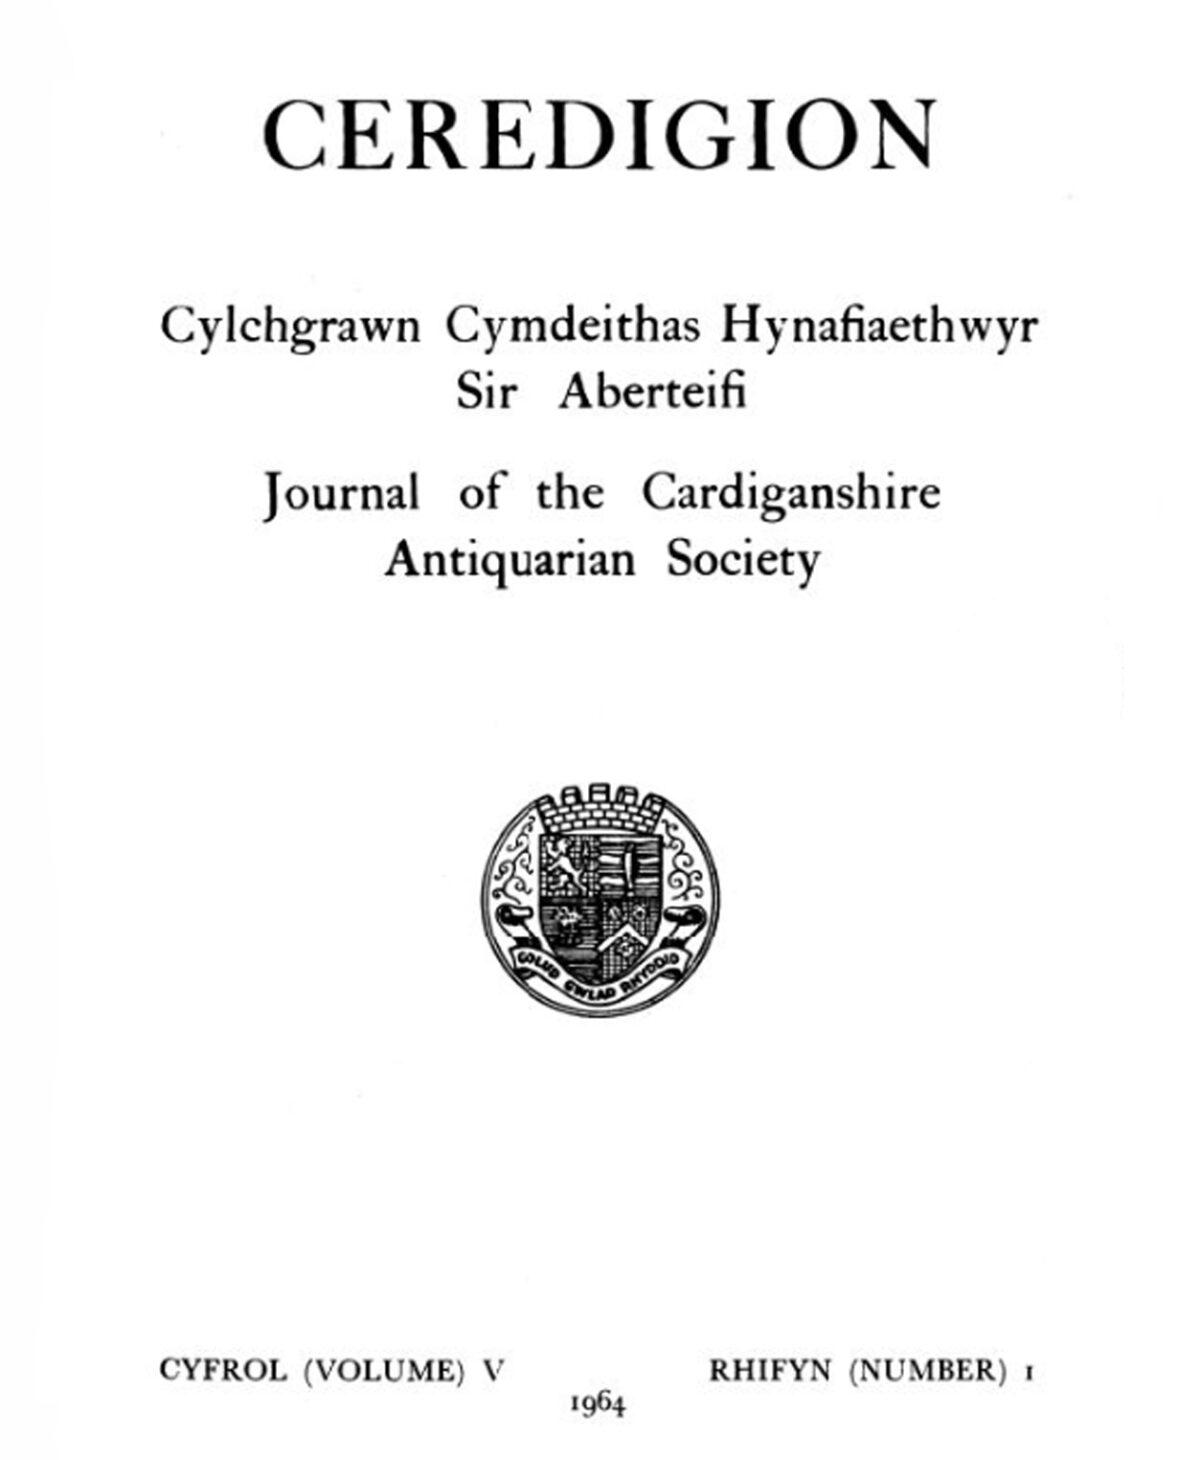 Ceredigion – Journal of the Cardiganshire Antiquarian Society, 1964 Vol V No I